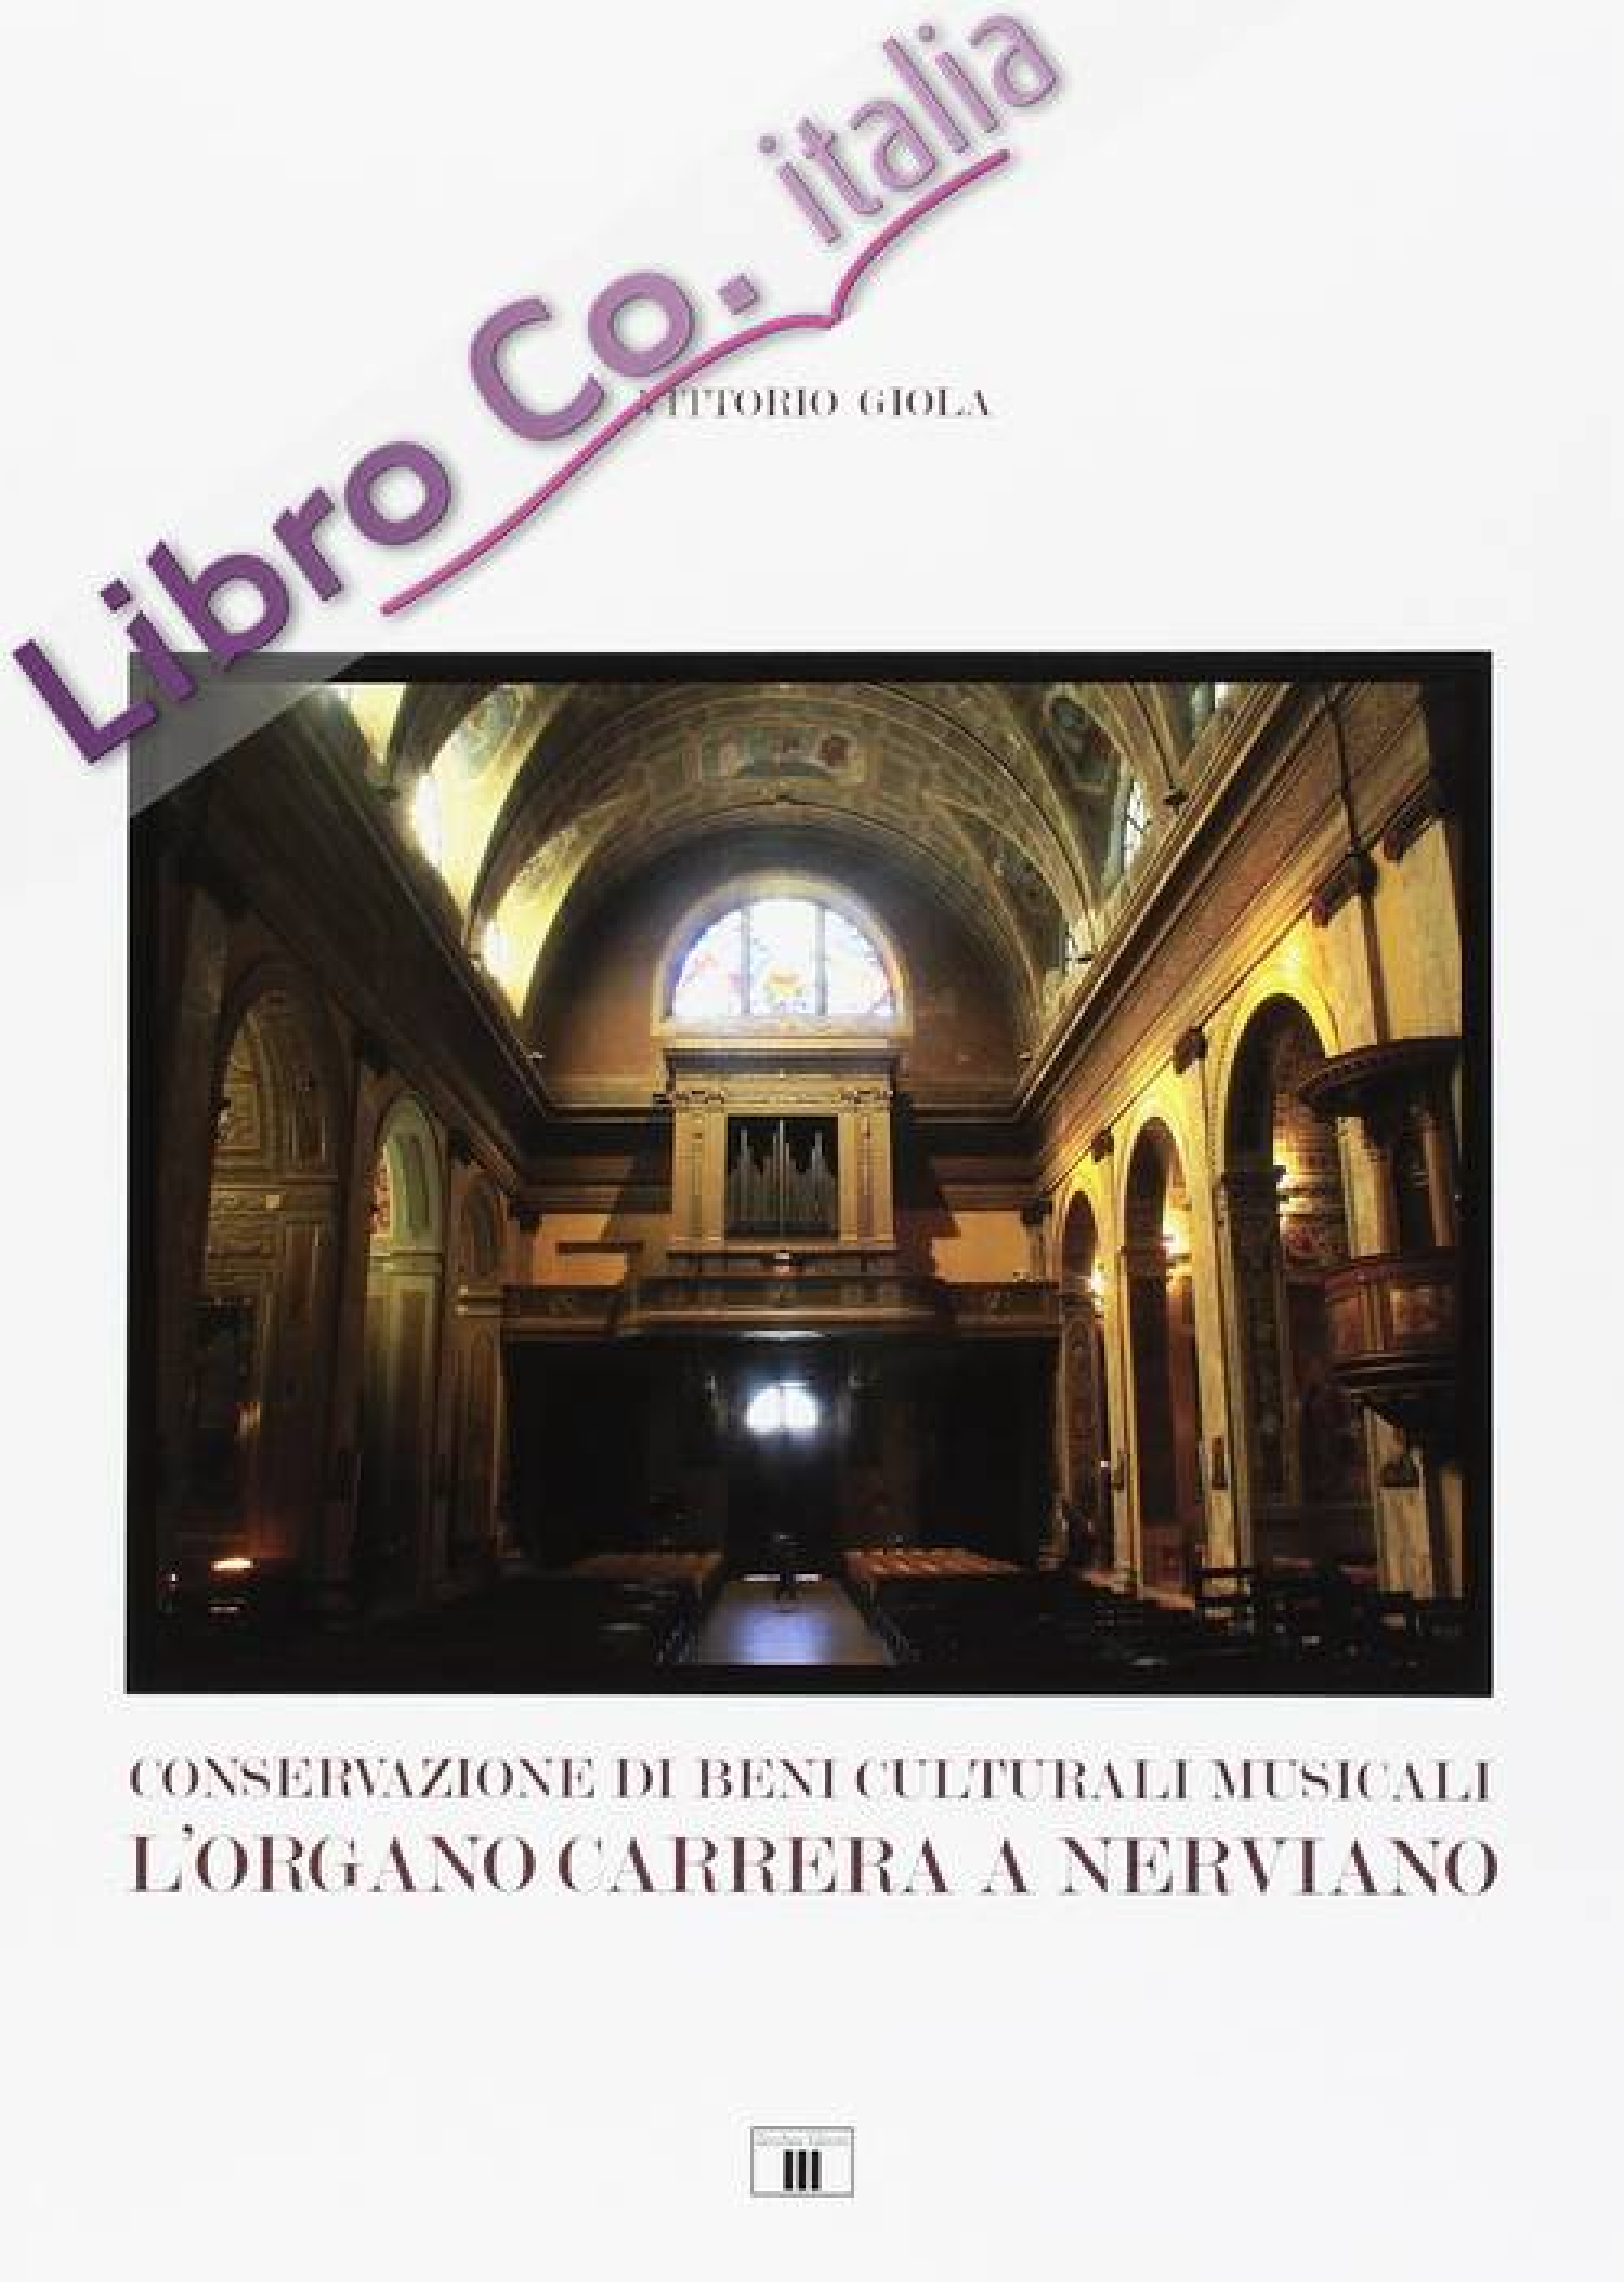 Conservazione di beni culturali musicali. L'organo Carrera a Nerviano